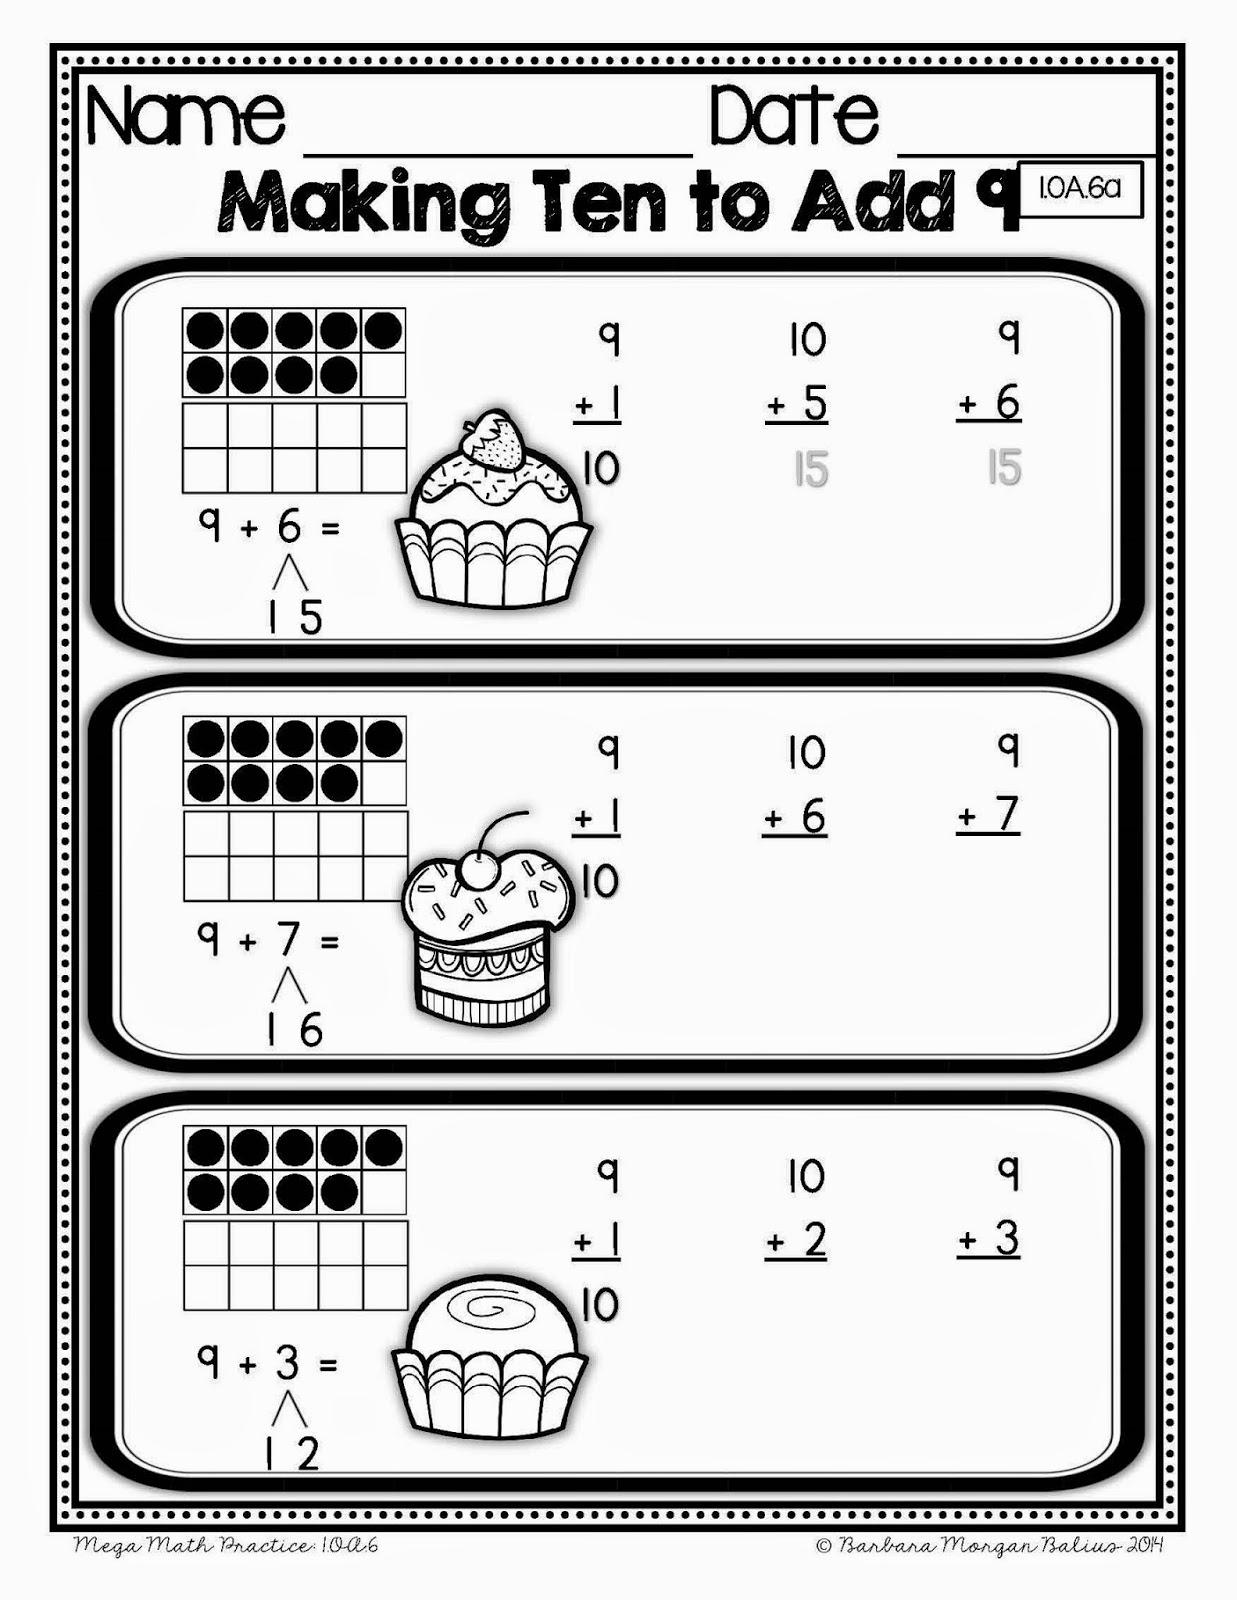 Mrs Balius's First Grade: Making Ten to Add